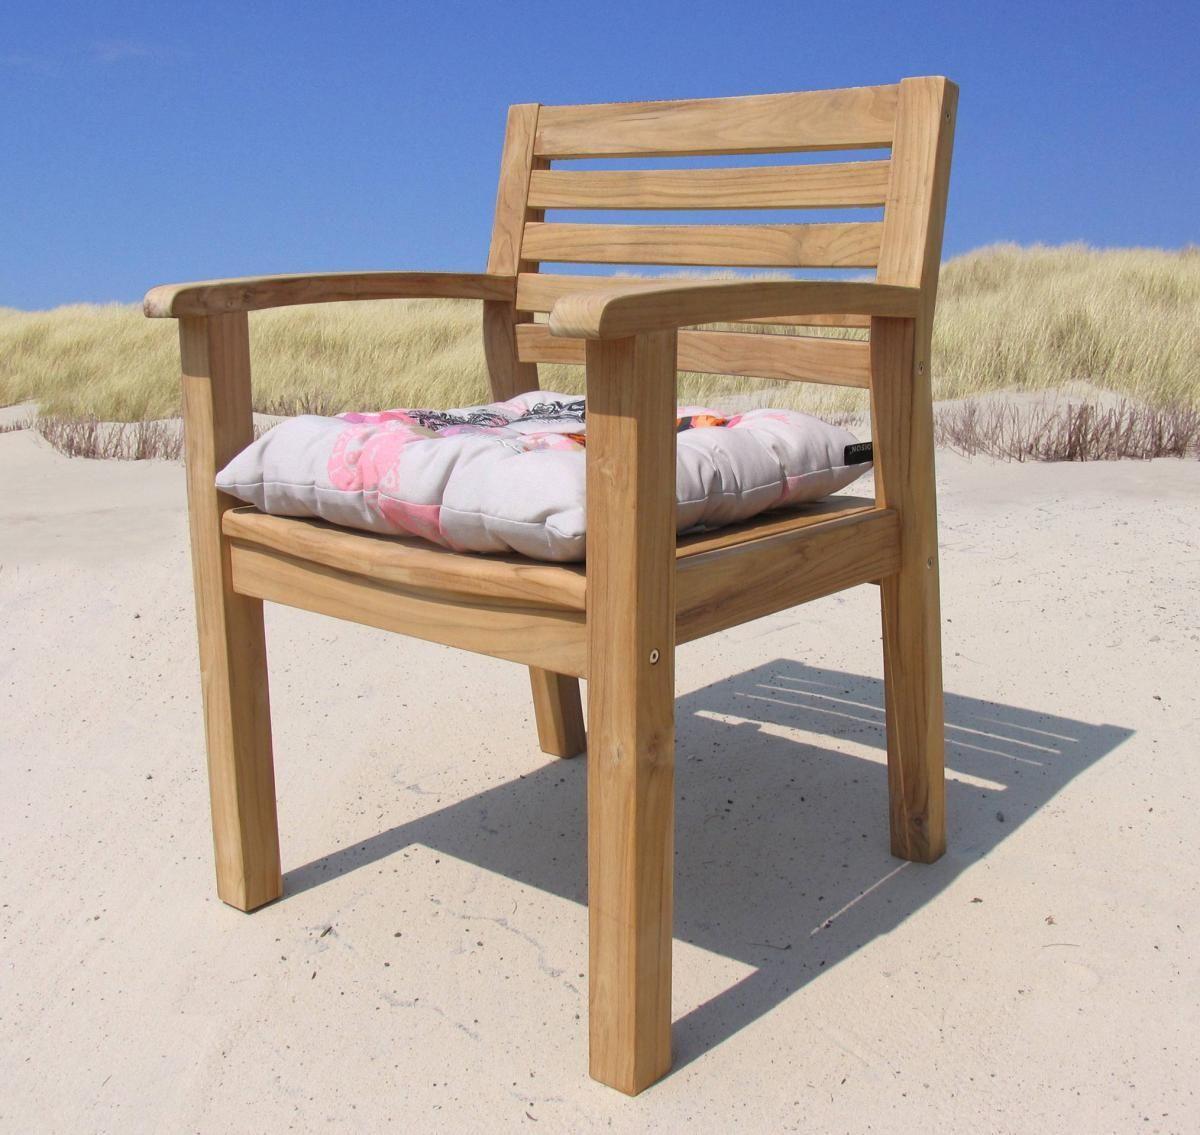 Grasekamp Gartenstuhl Sessel Teakstuhl Teak Holz Stuhl Mit Armlehne